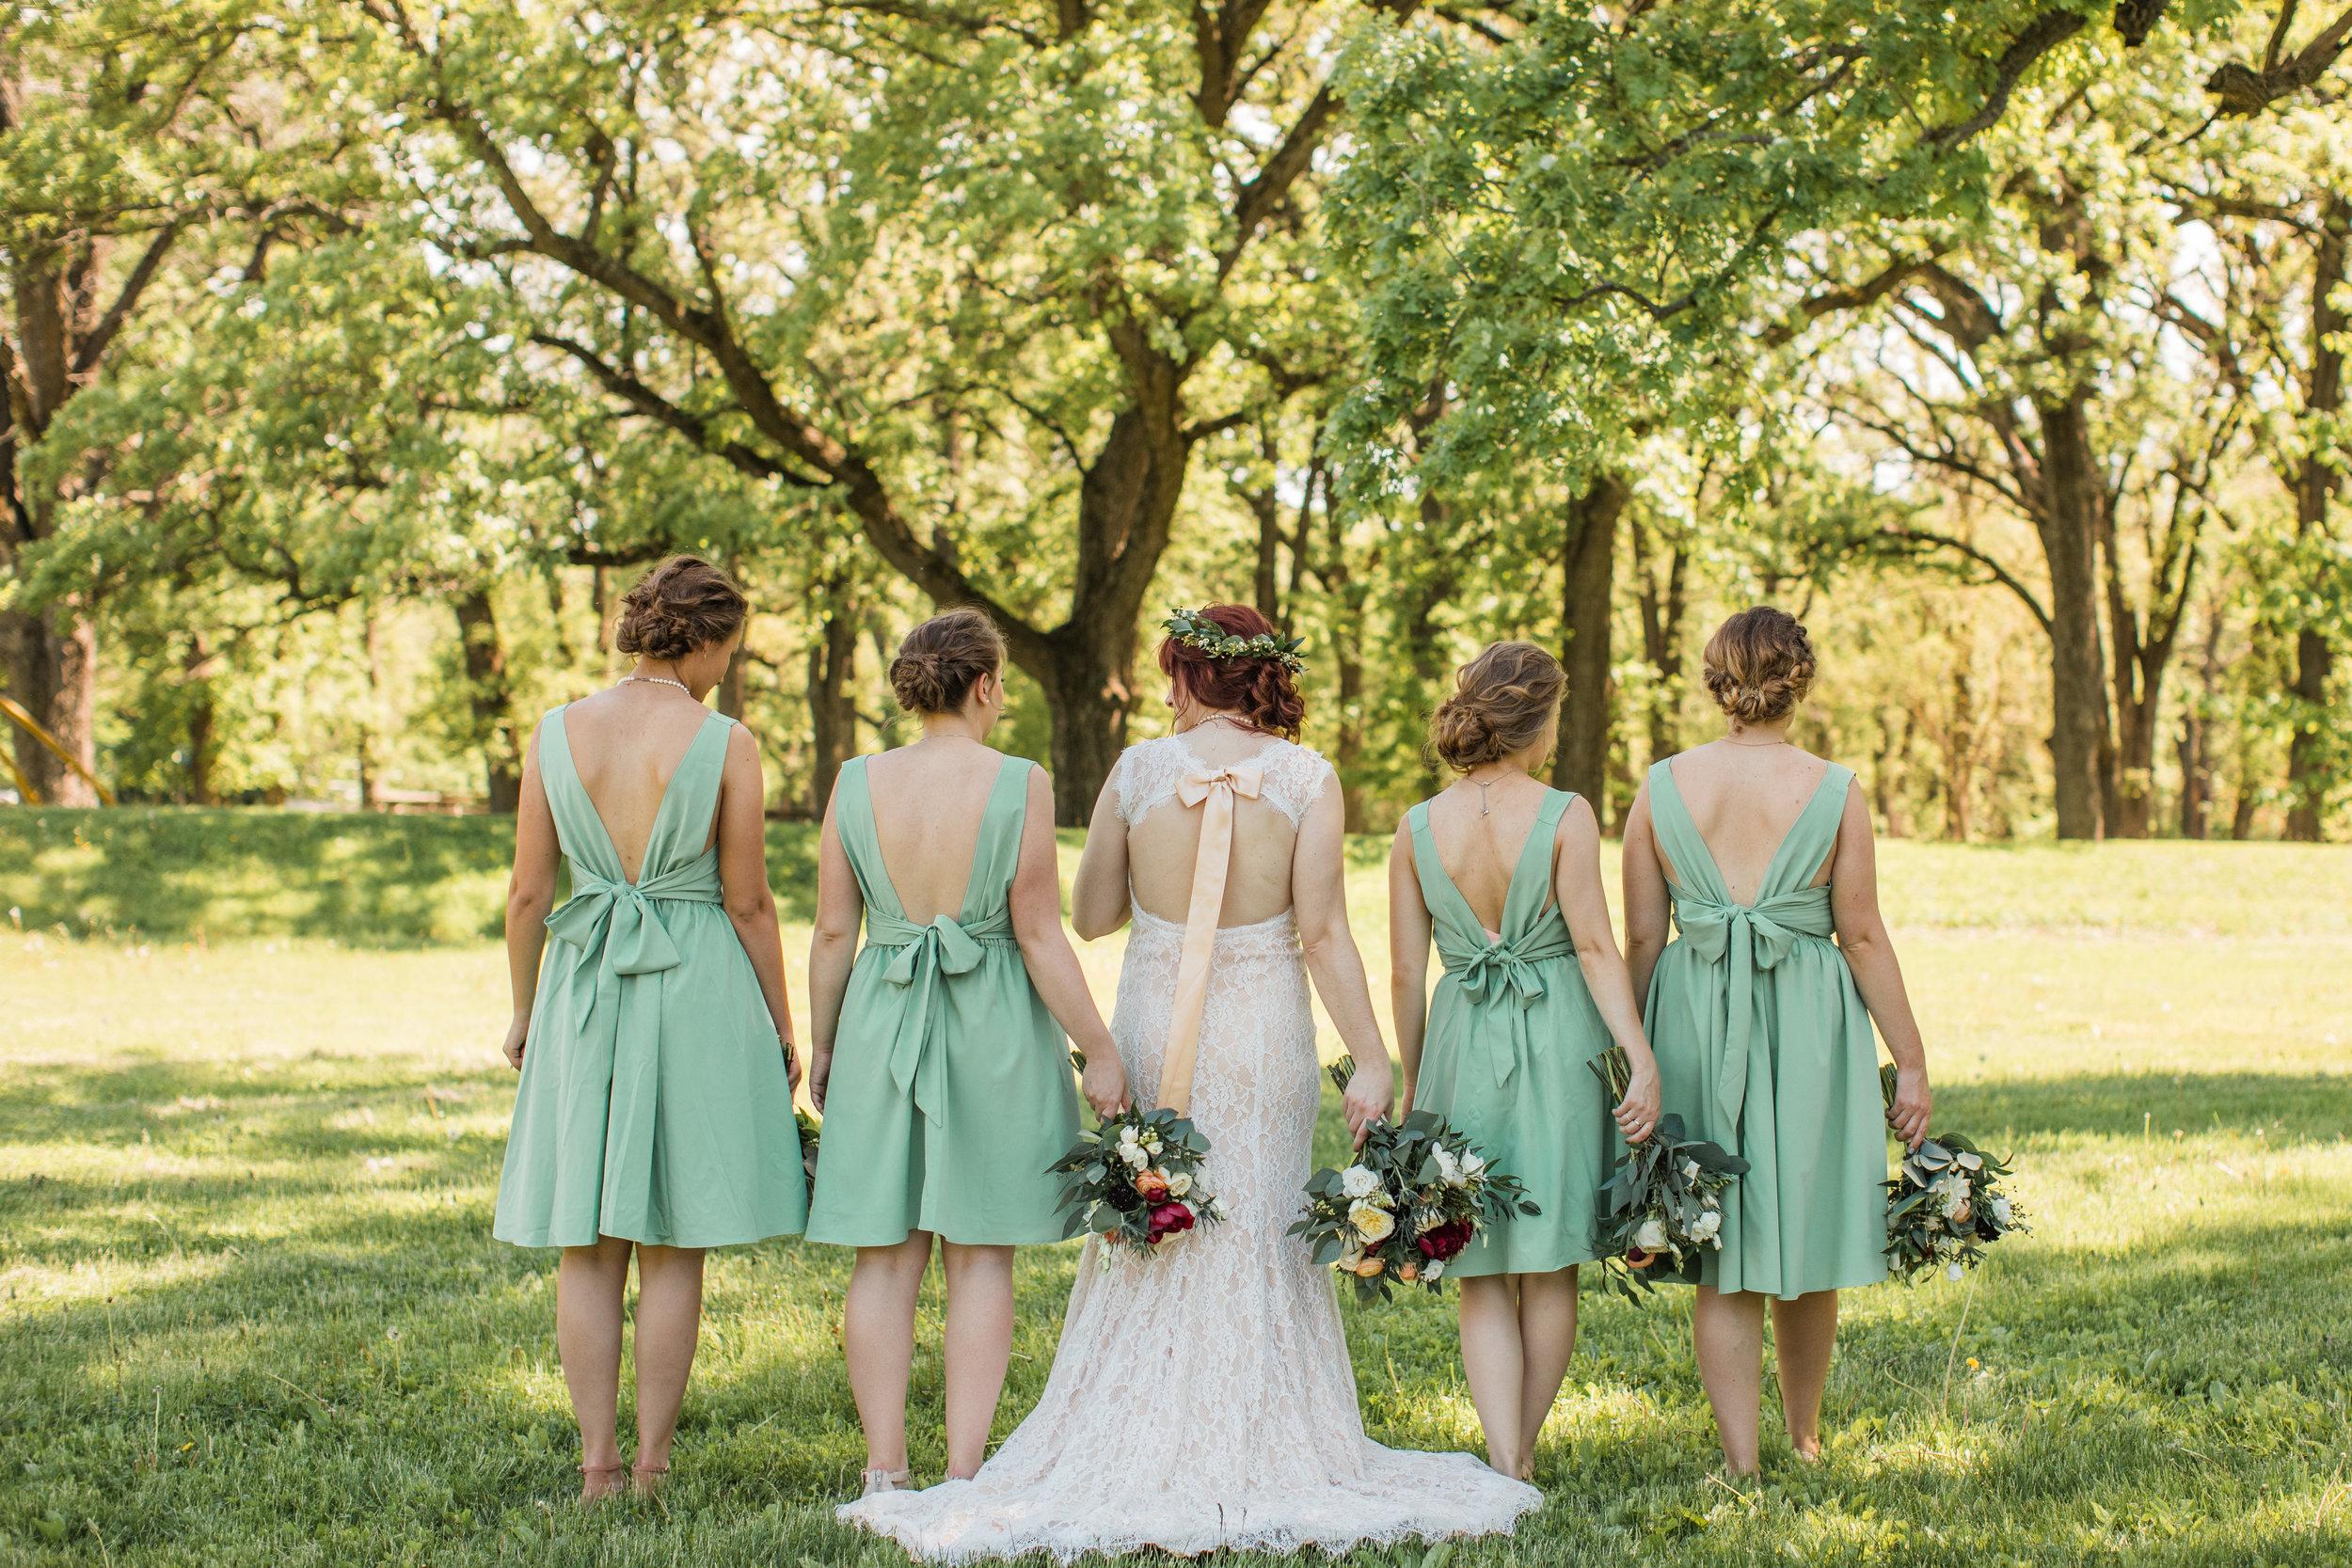 Morganne-Bobby-wedding-228.jpg